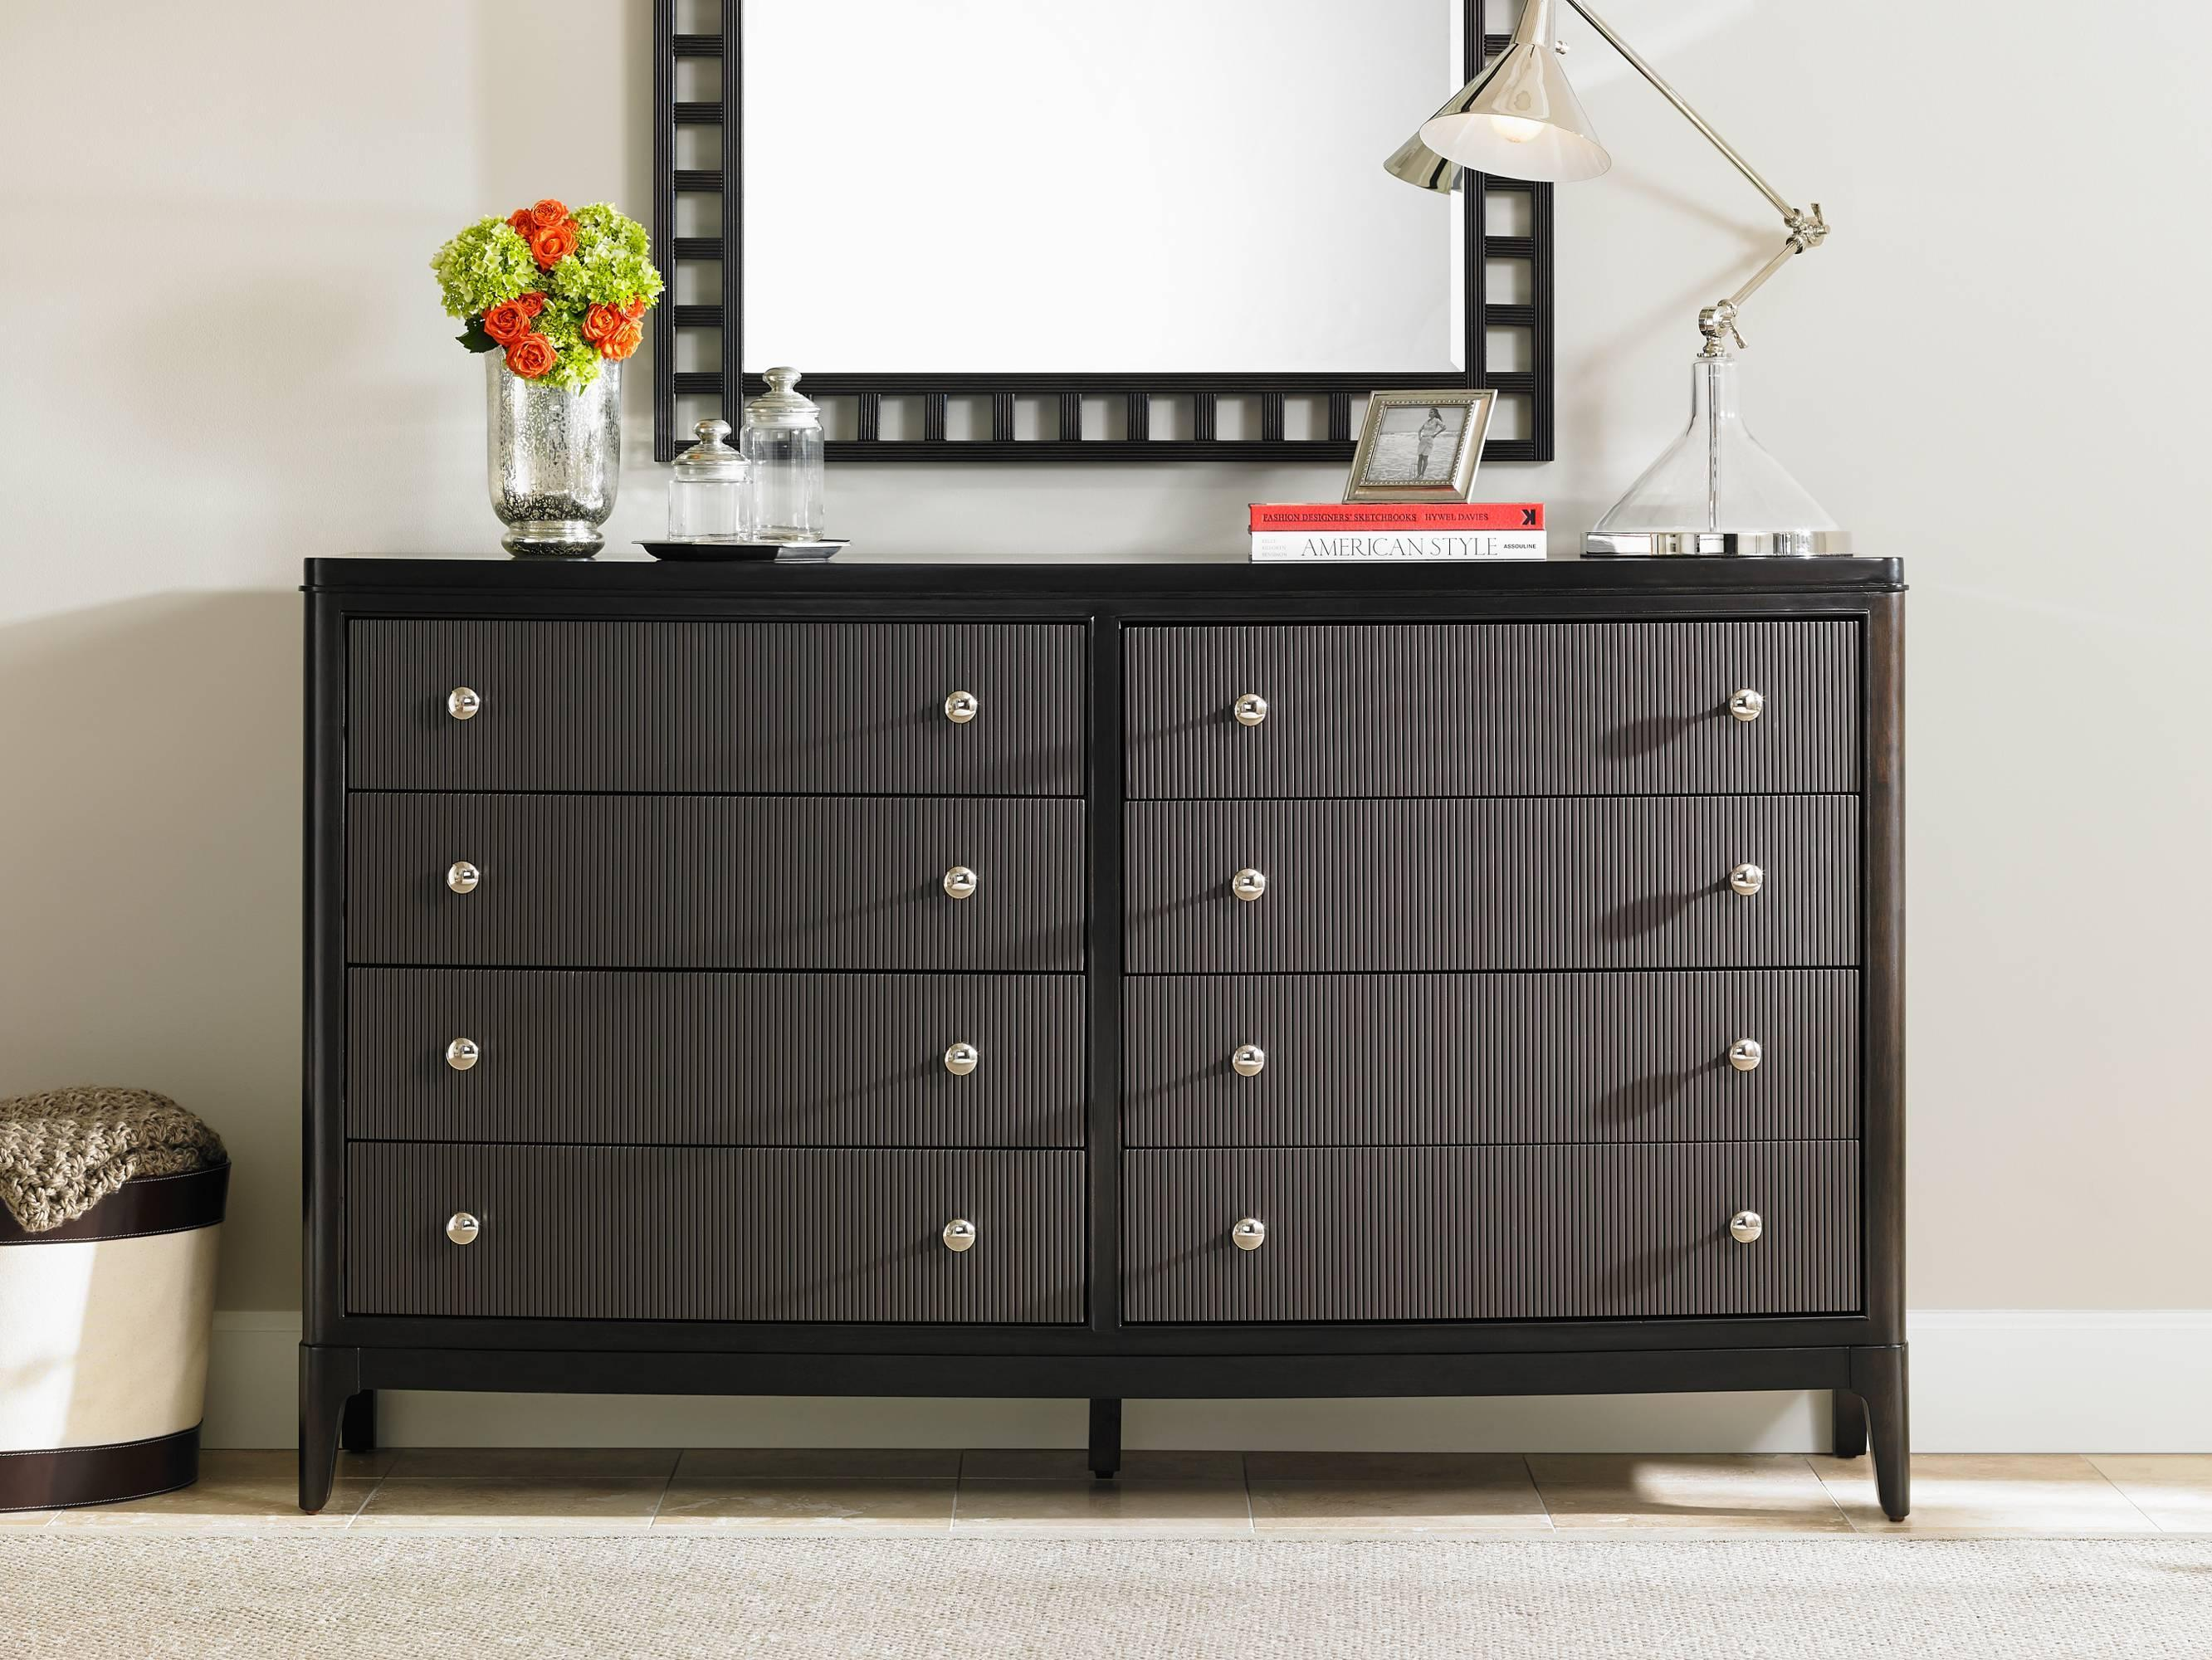 Stanley Furniture Wicker Park  Dresser and Mirror Set - Item Number: 409-13-30+05